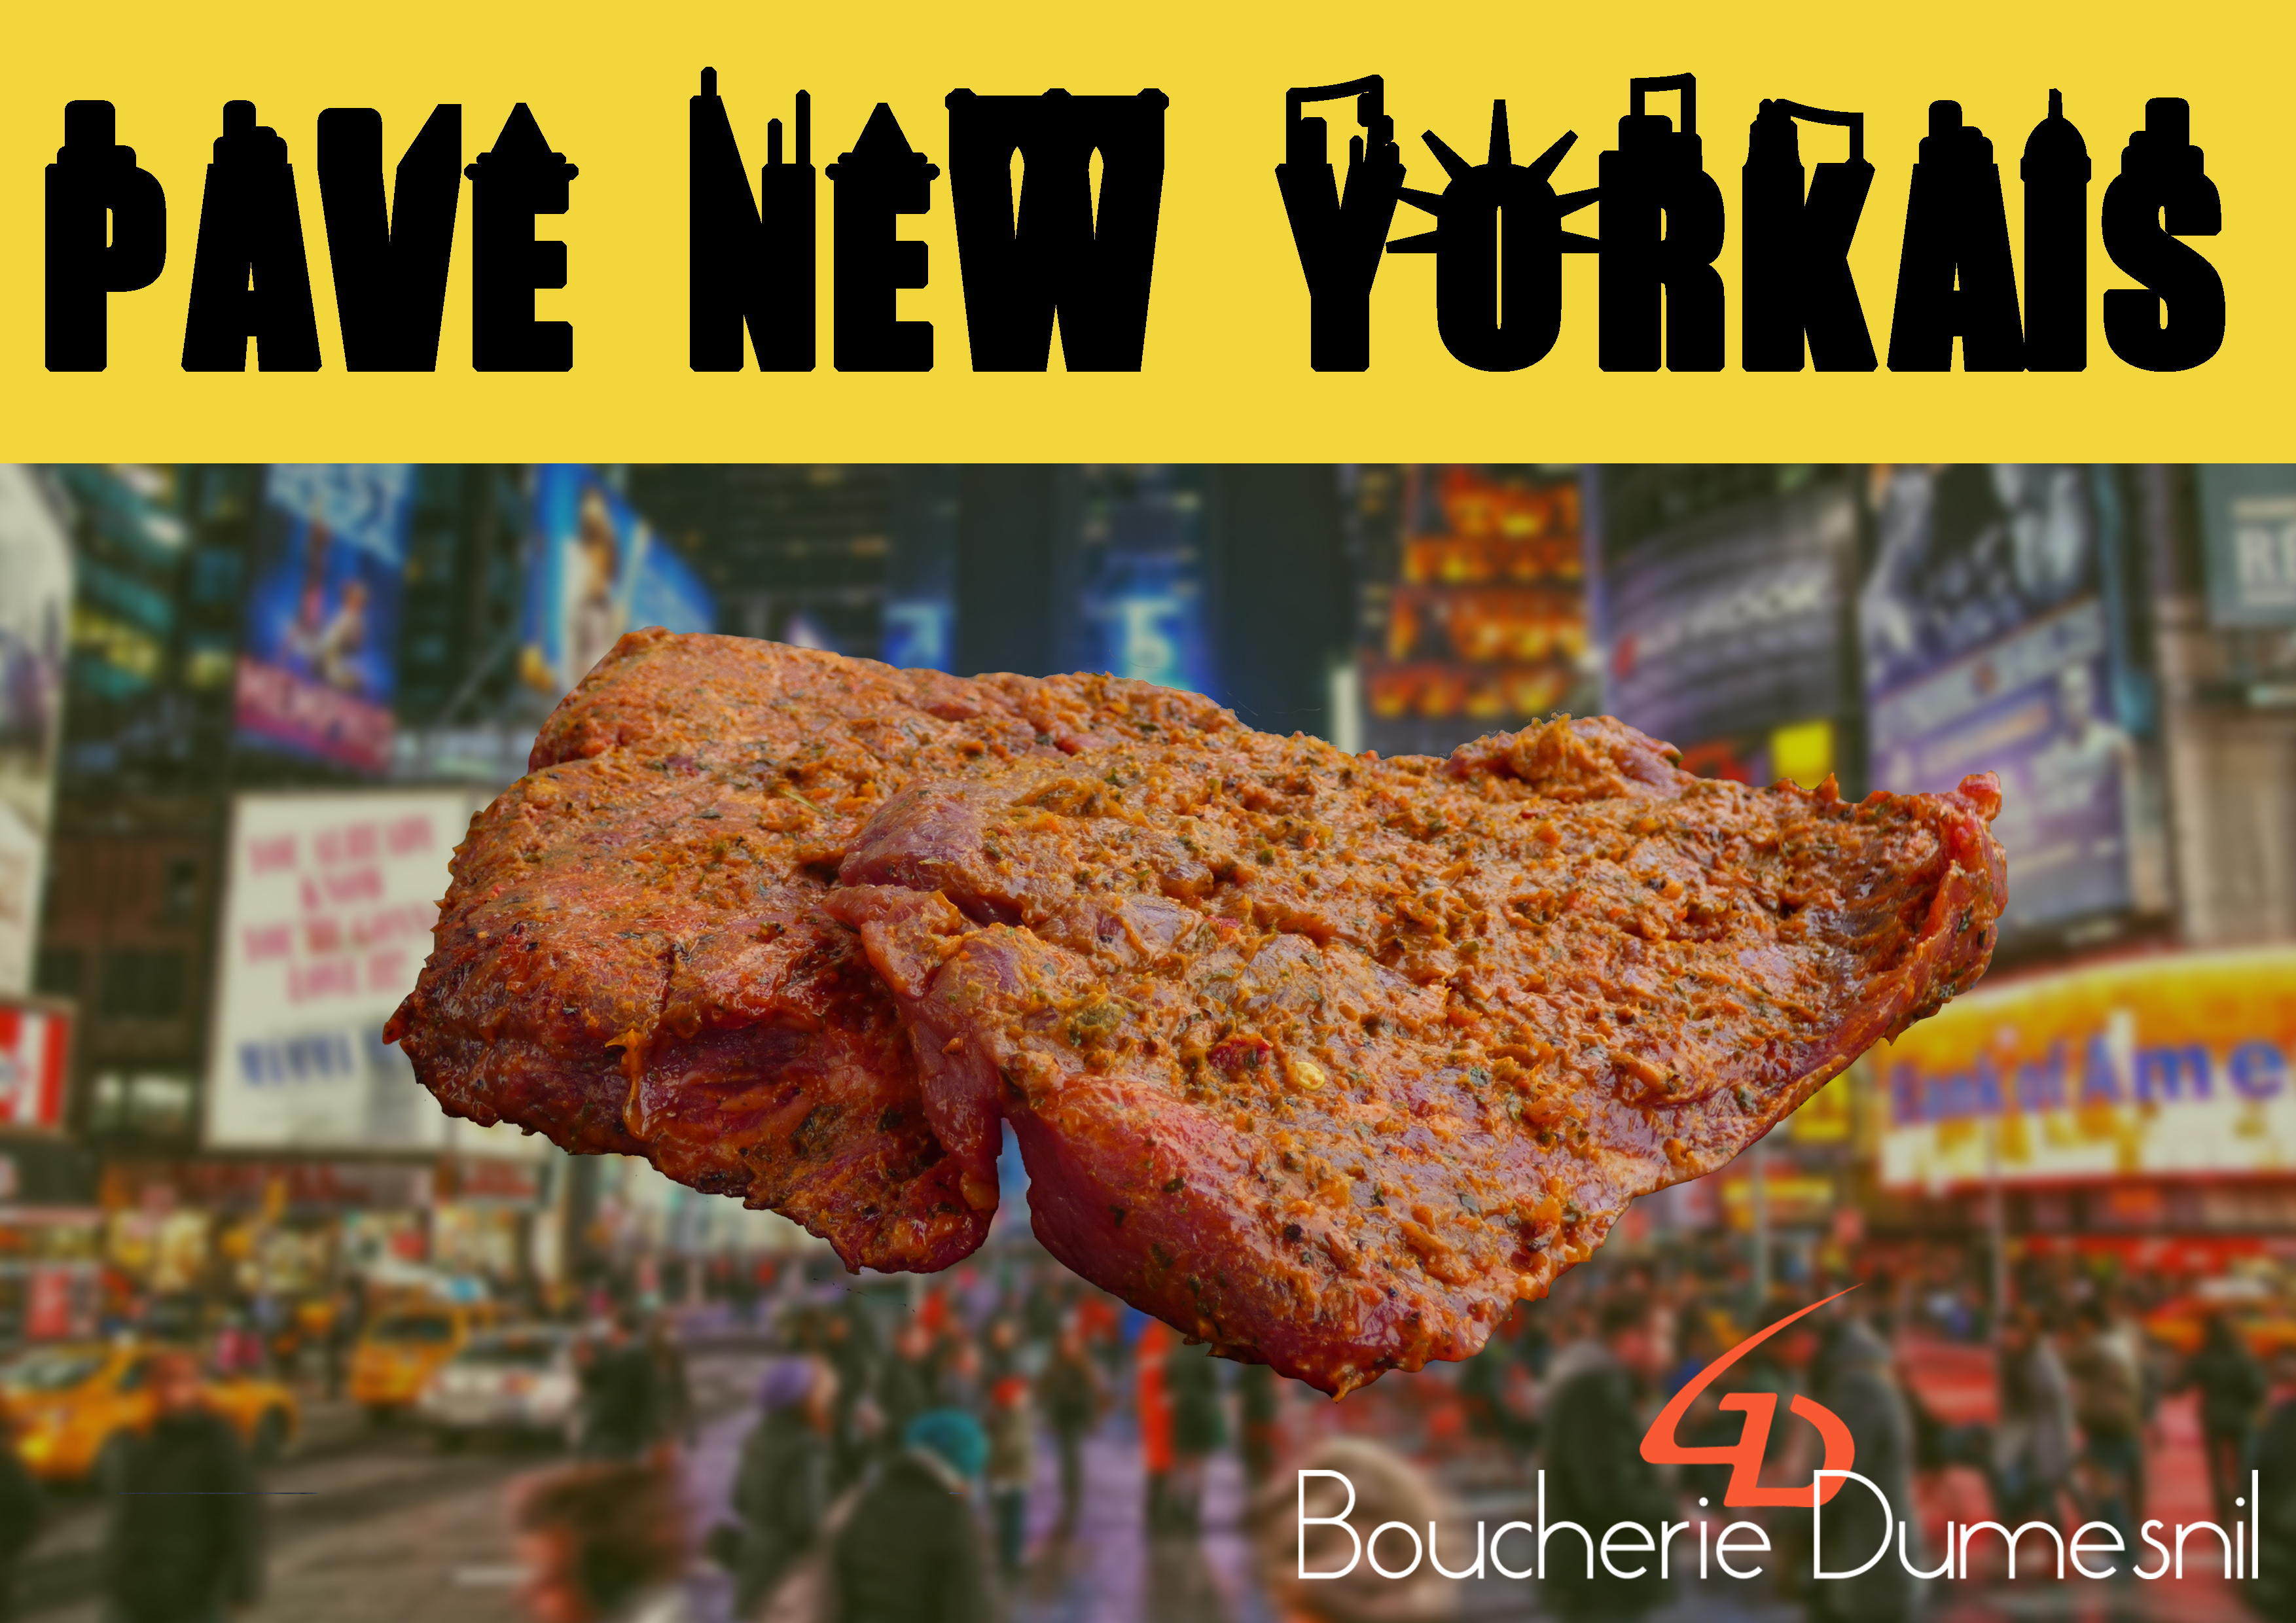 PAVE NEW YORKAIS